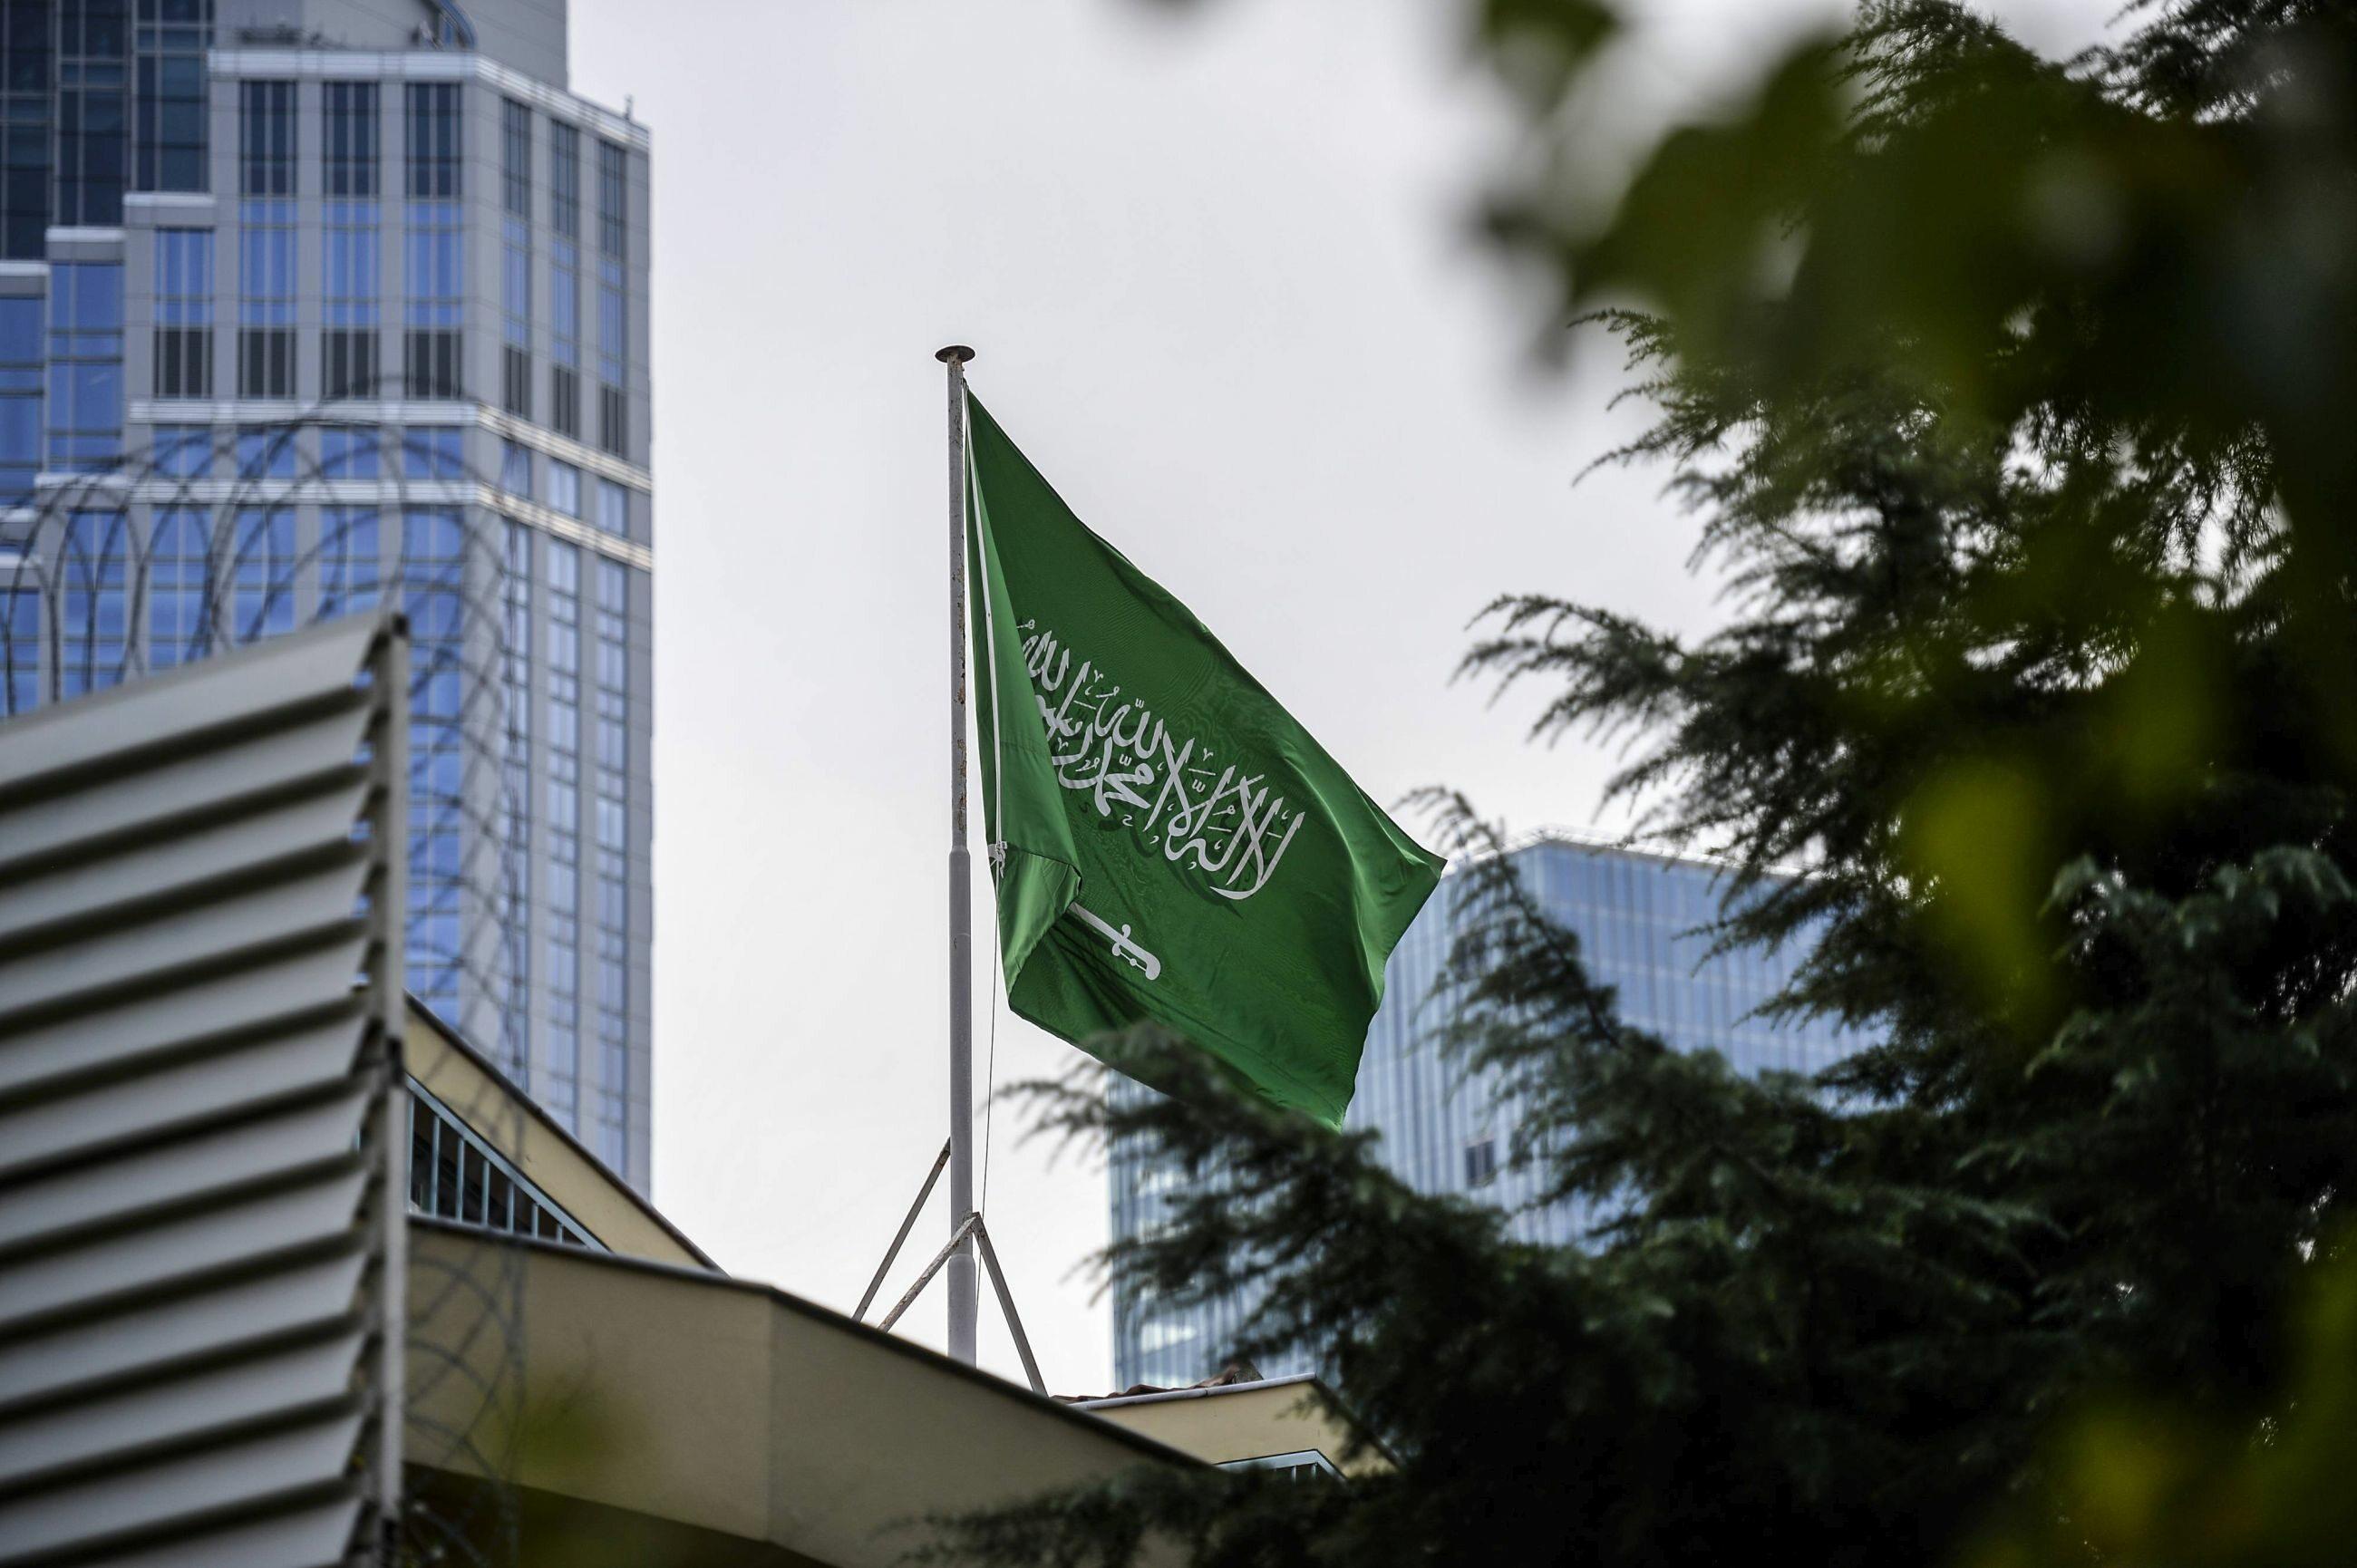 Konsulat Arabii Saudyjskiej w Stambule